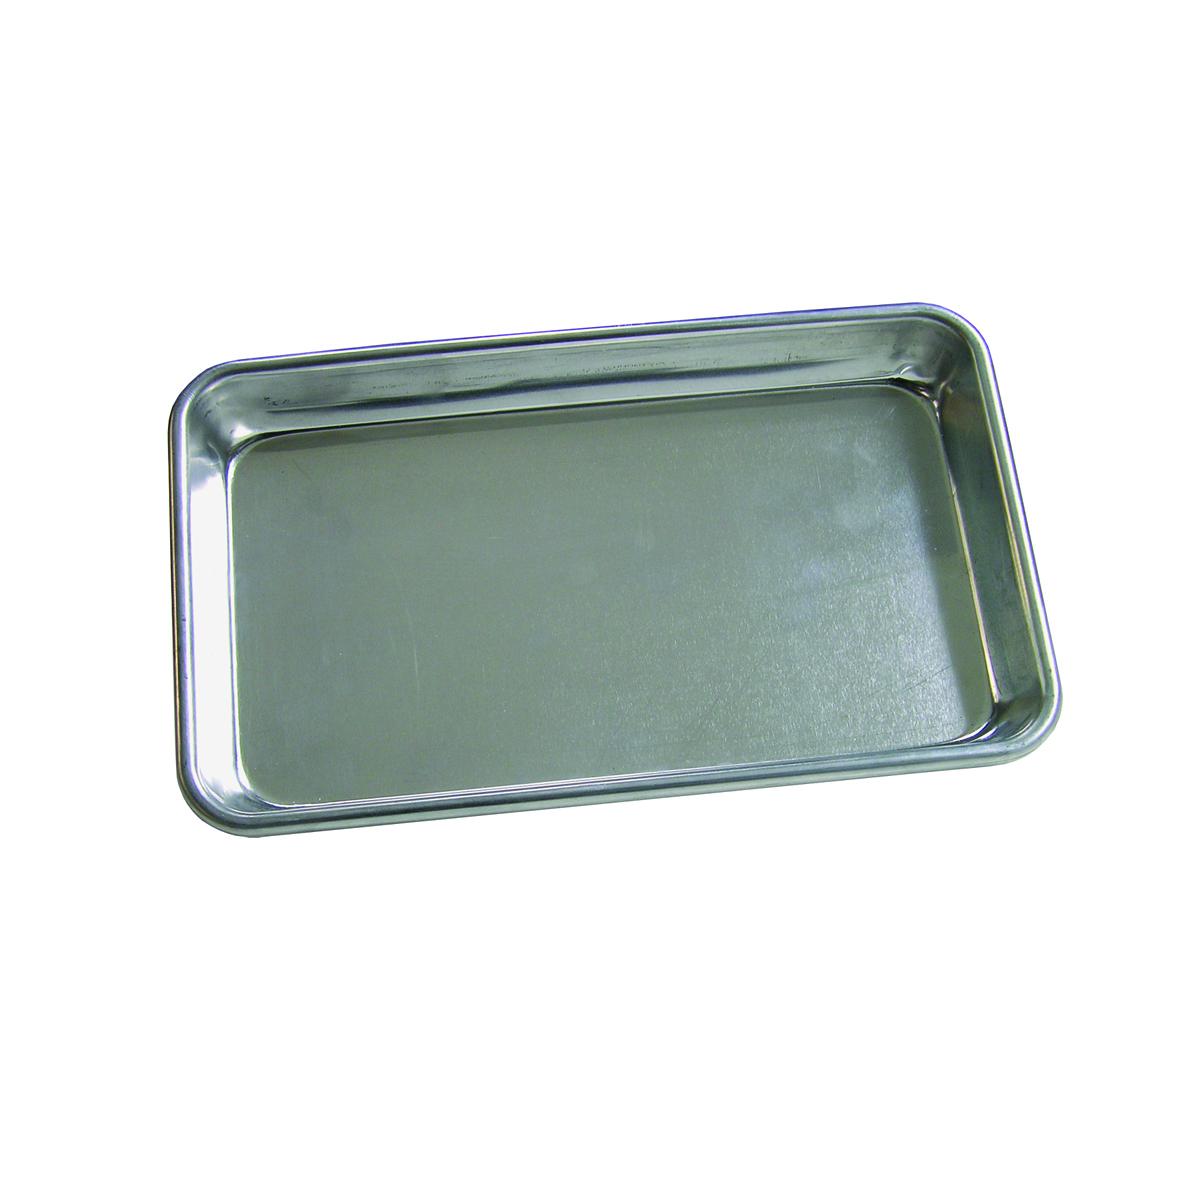 1800-23 Crown Brands, LLC ABNP-13 bun / sheet pan